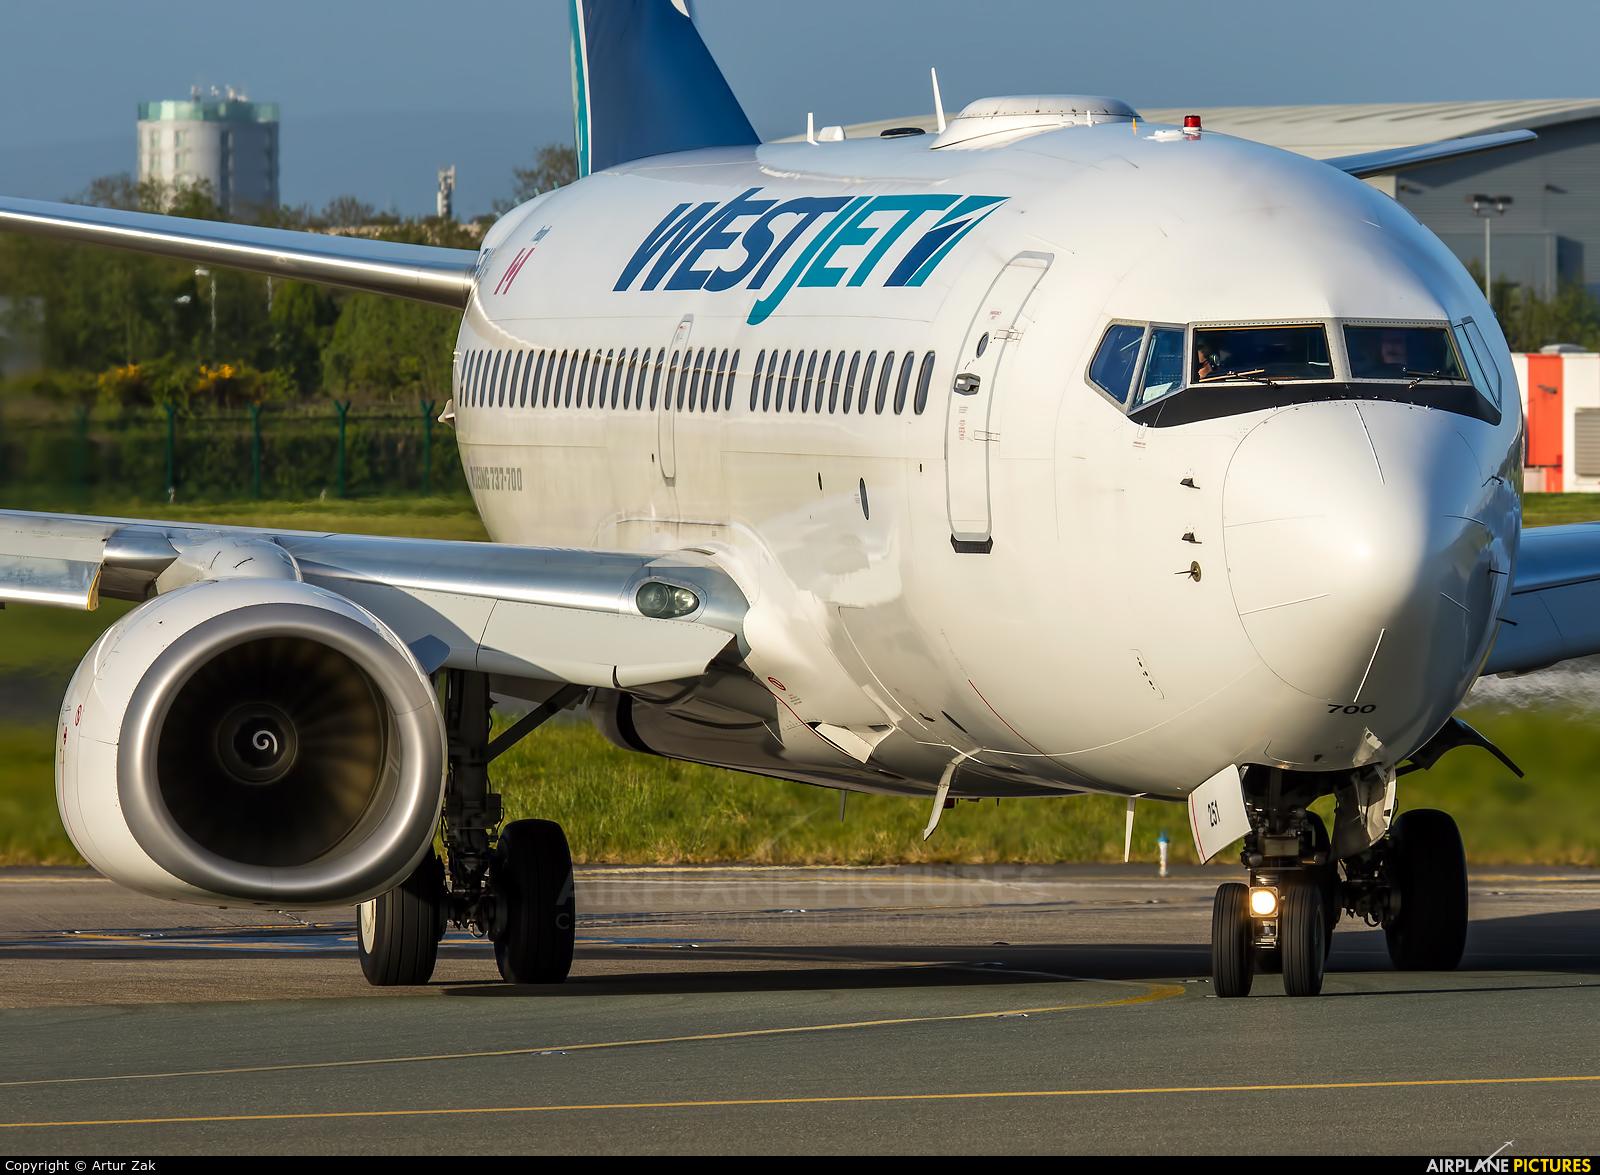 WestJet Airlines C-FWSK aircraft at Dublin